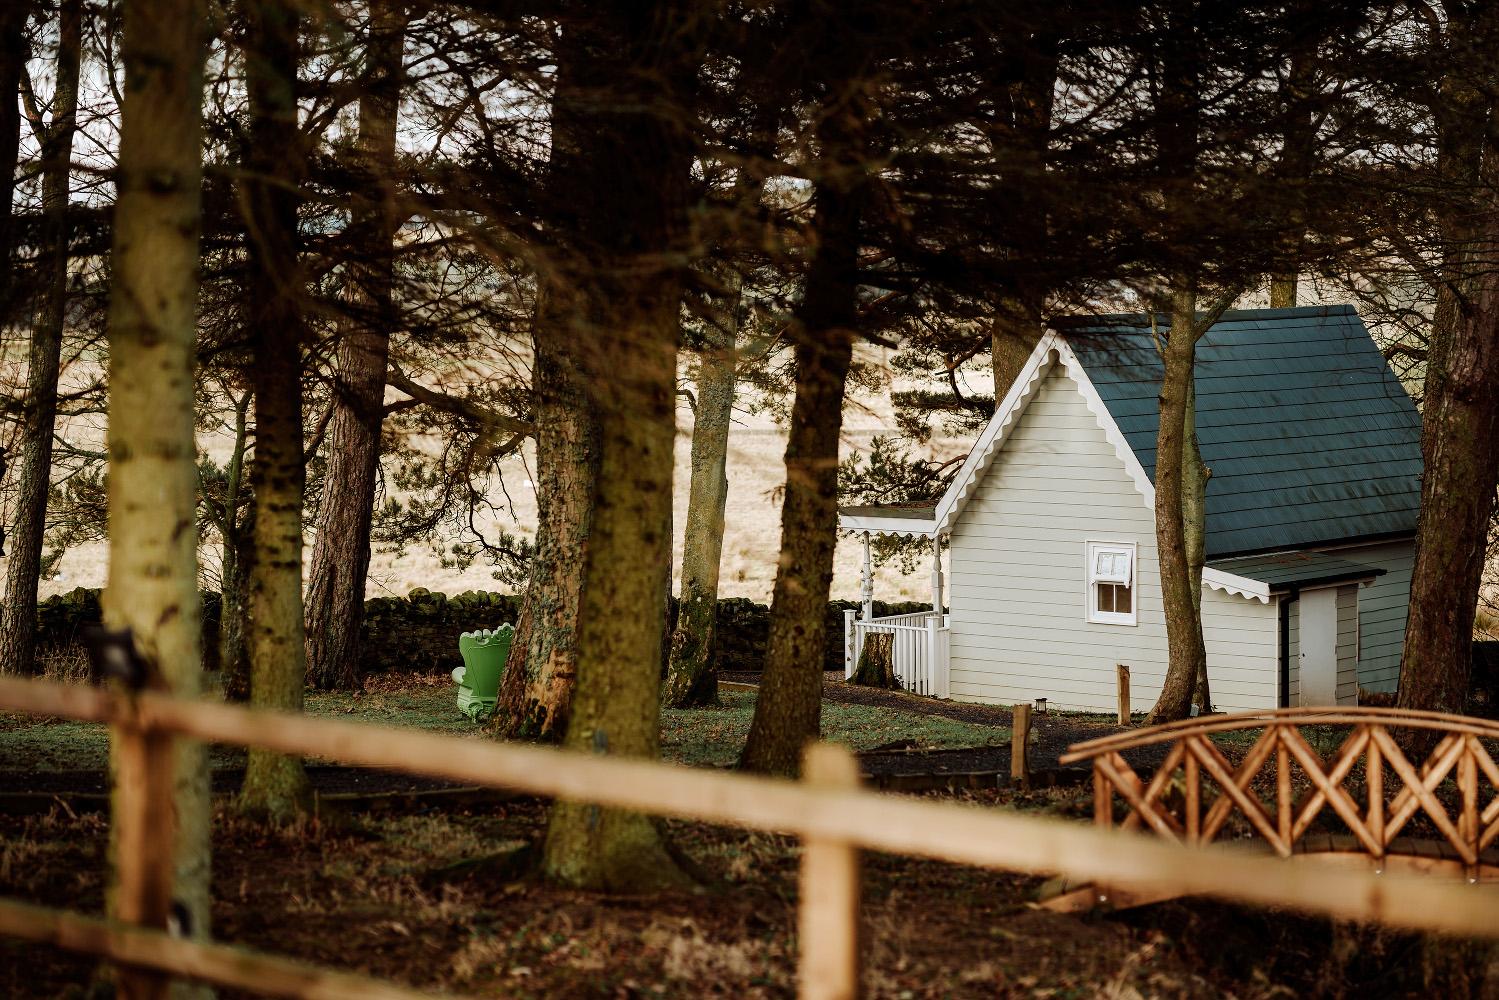 a hidden cottage amongst trees